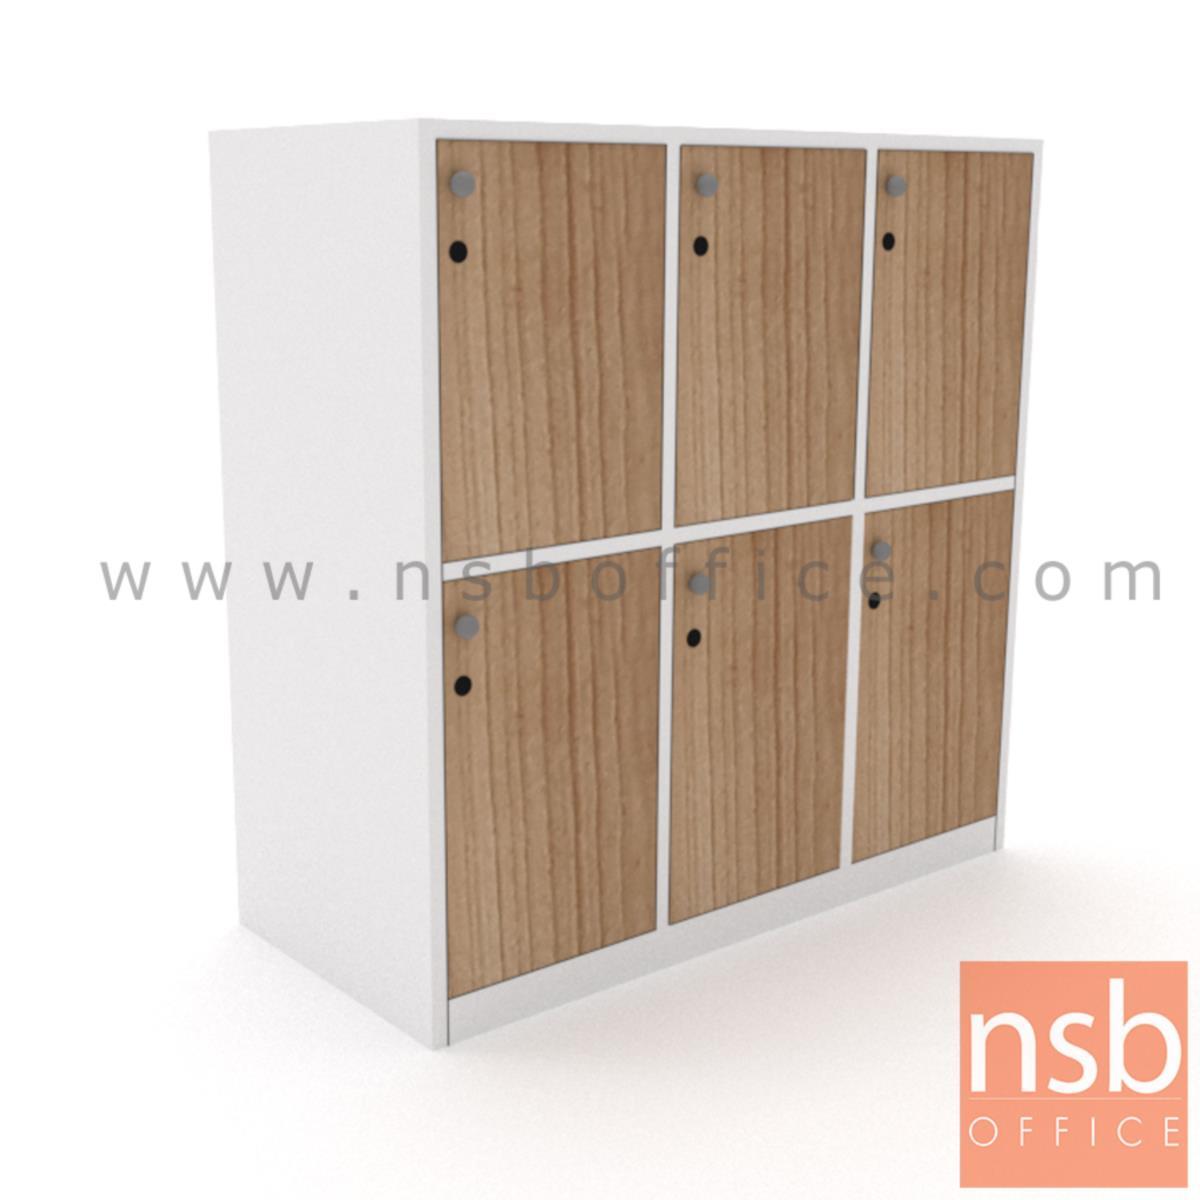 C13A001:ตู้ล็อกเกอร์ไม้ 6 ประตู  รุ่น Nivosa 1 (นิโวซ่า 1) ขนาด 90W*90H ,120H cm. พร้อมกุญแจล็อค